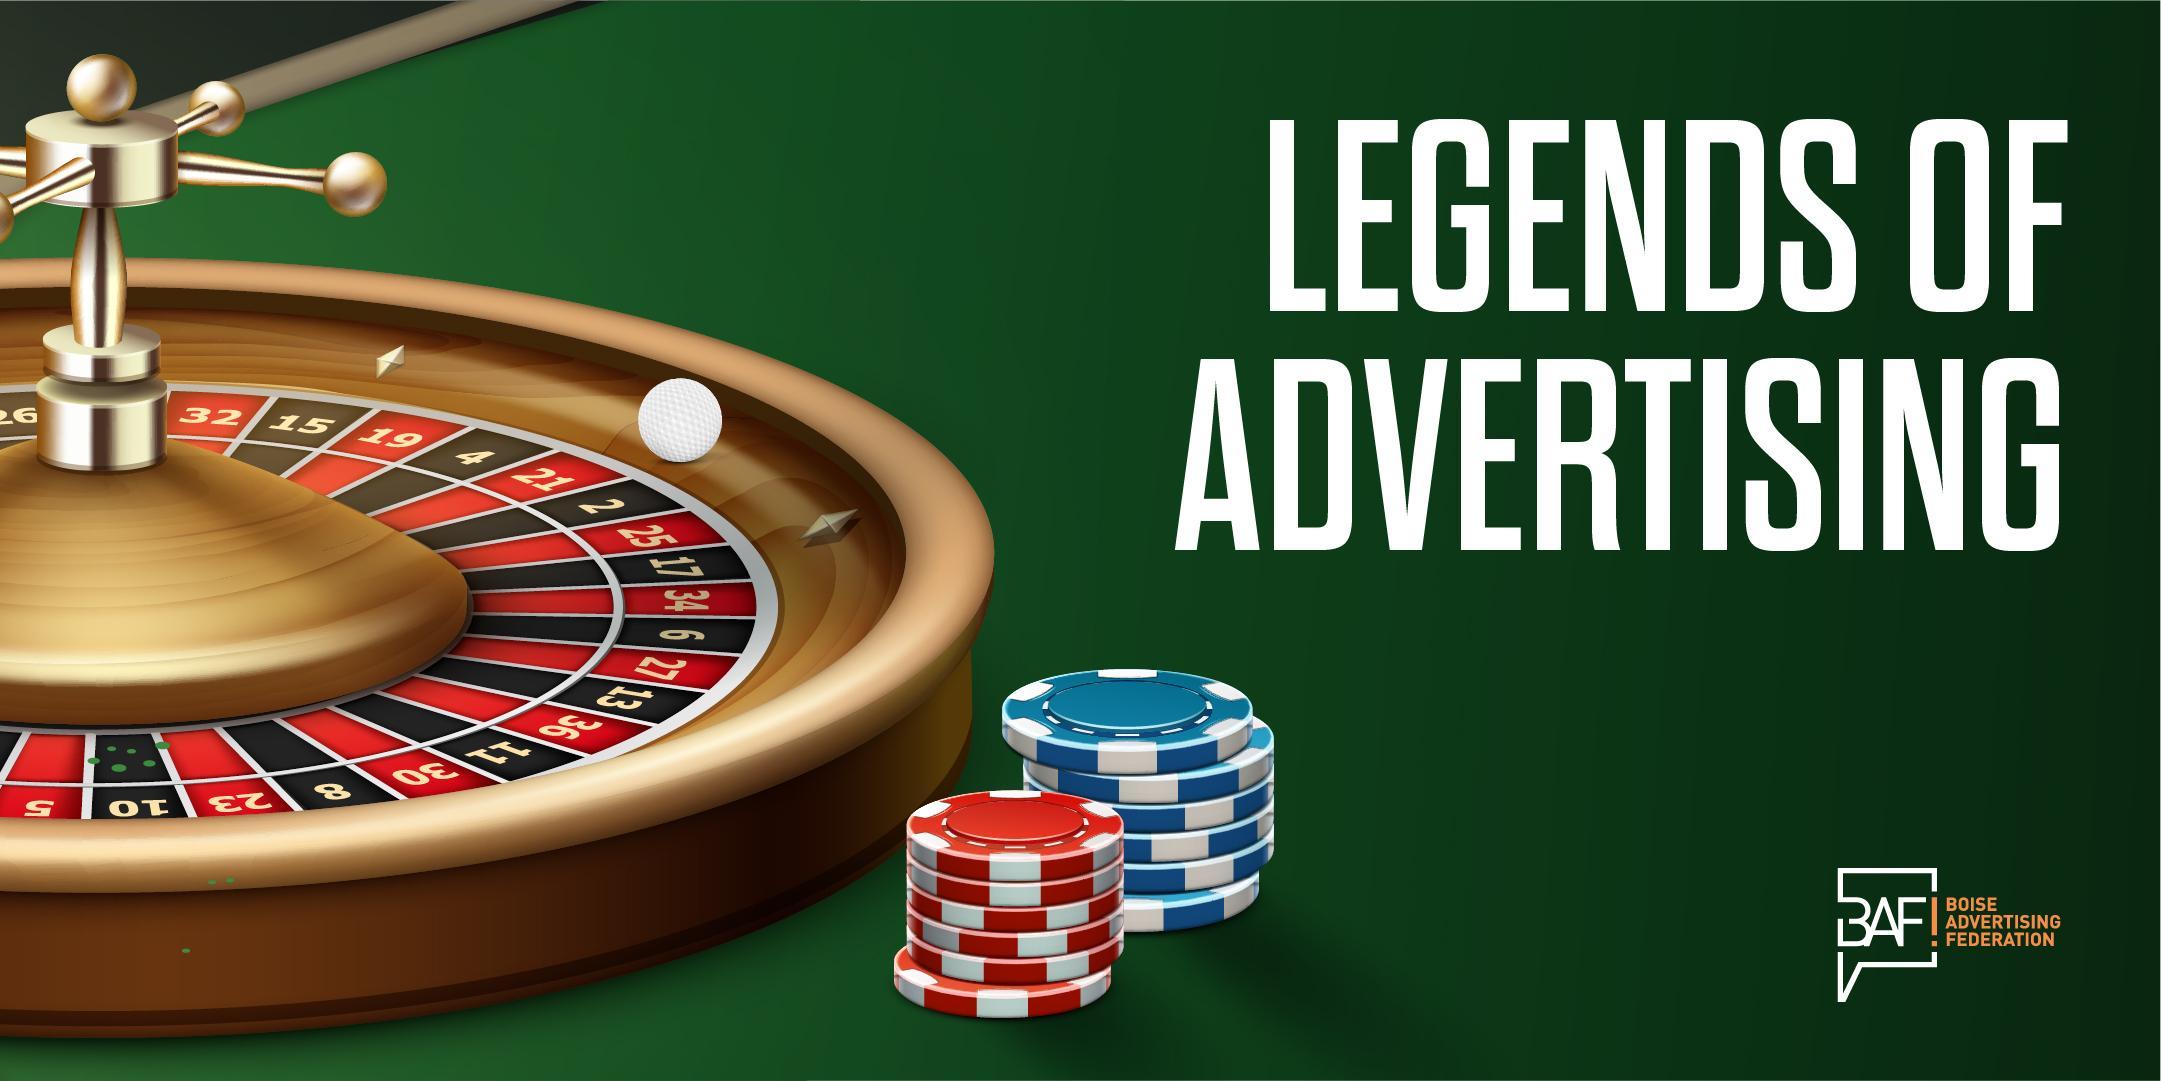 2021 BAF Legends of Advertising Golf Tournament